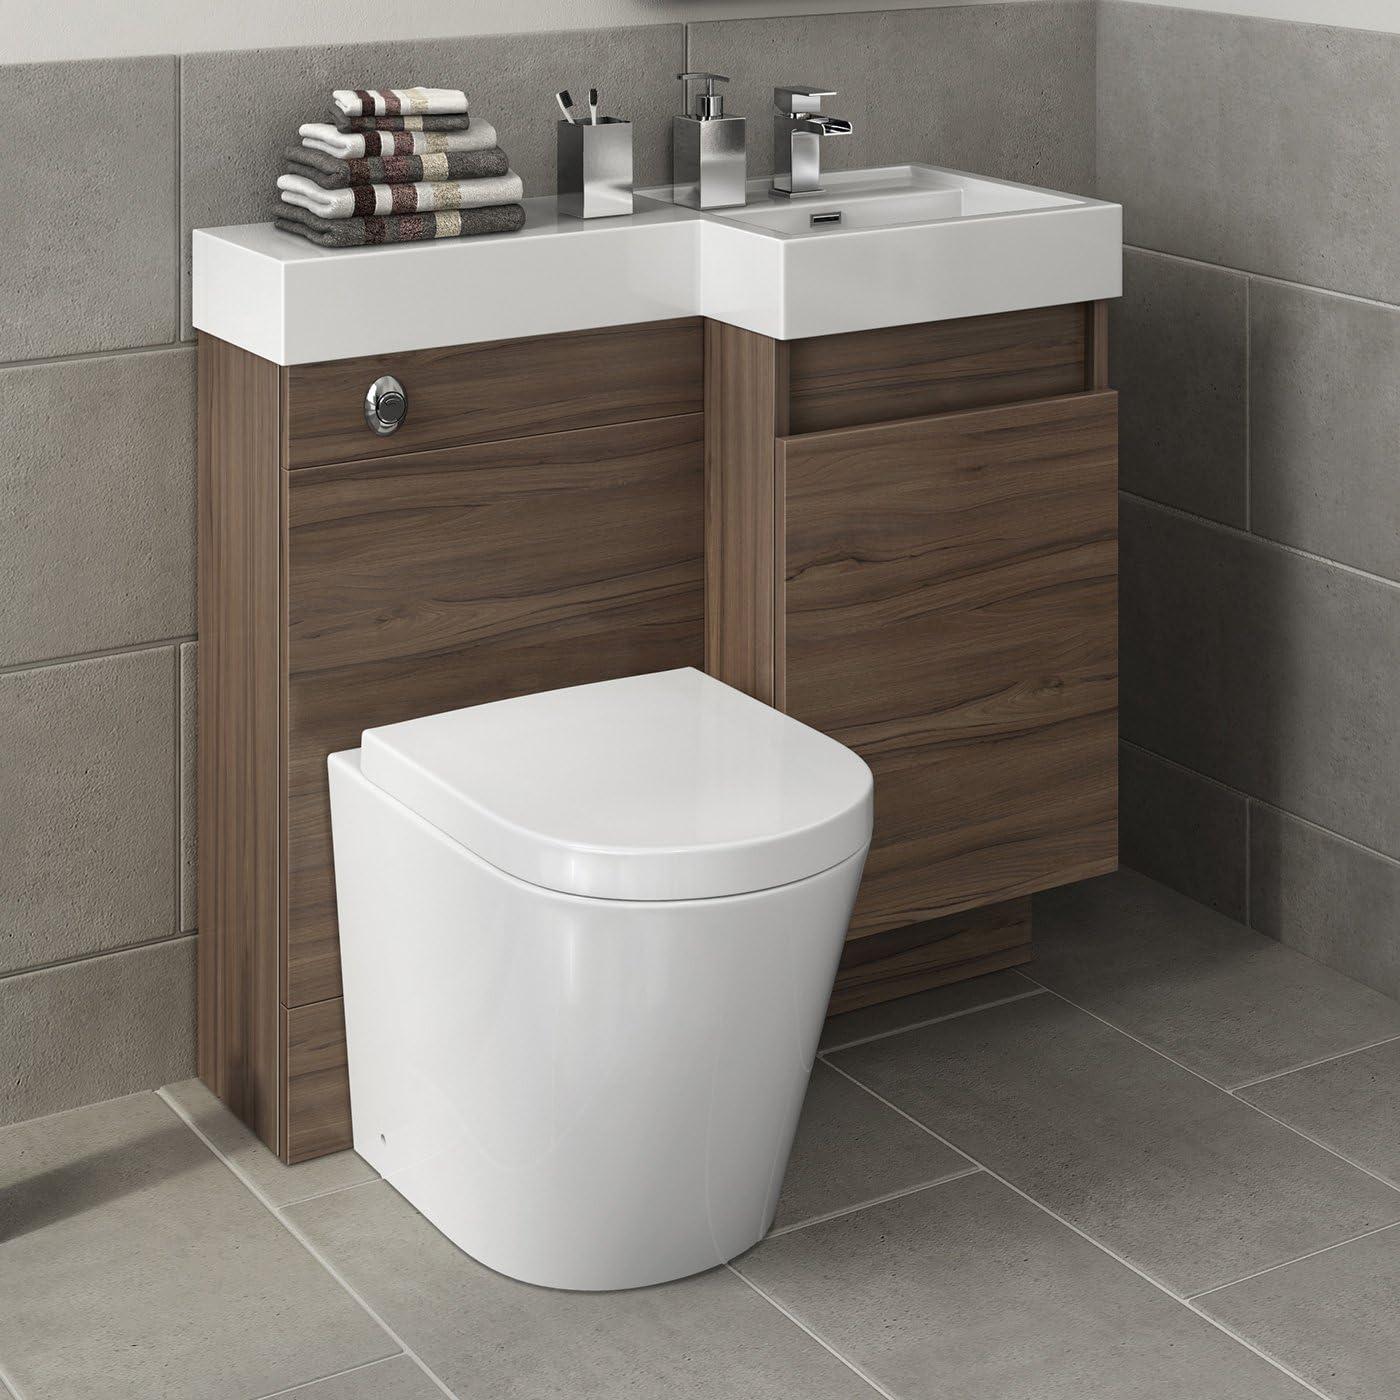 8mm Walnut Vanity Unit Back to Wall Toilet Bathroom Sink